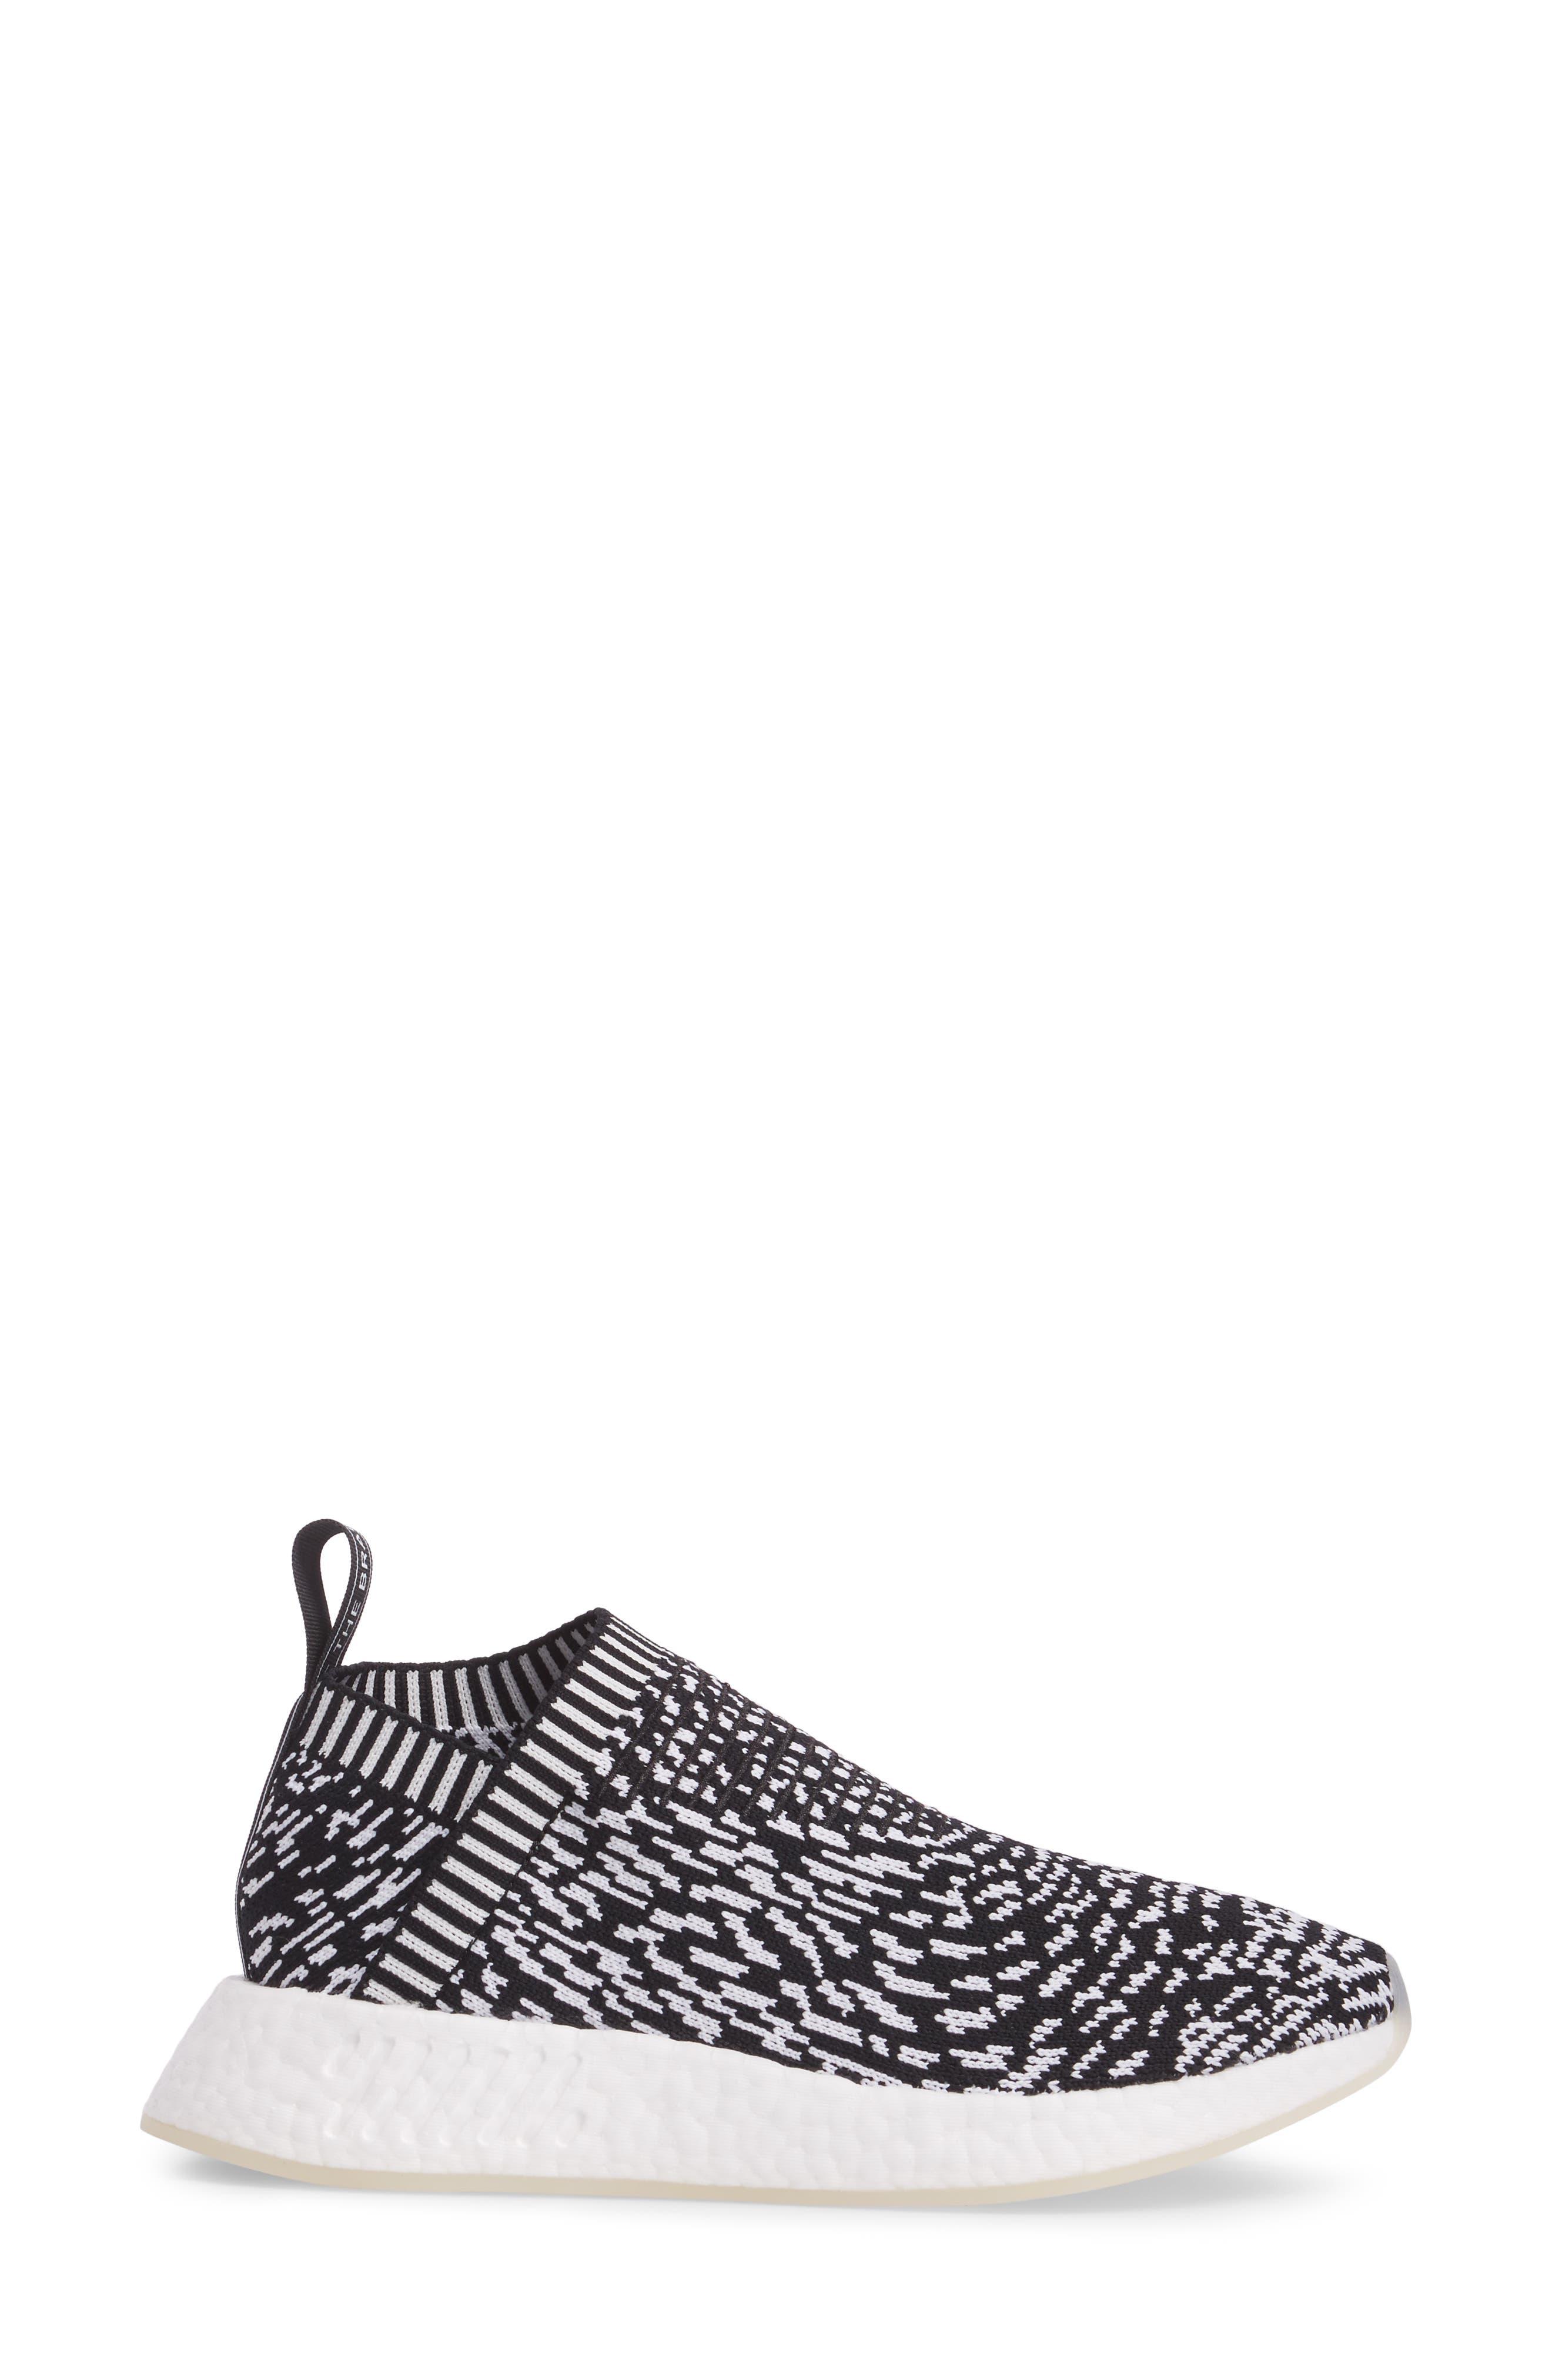 NMD_CS2 Primeknit Sneaker,                             Alternate thumbnail 3, color,                             001